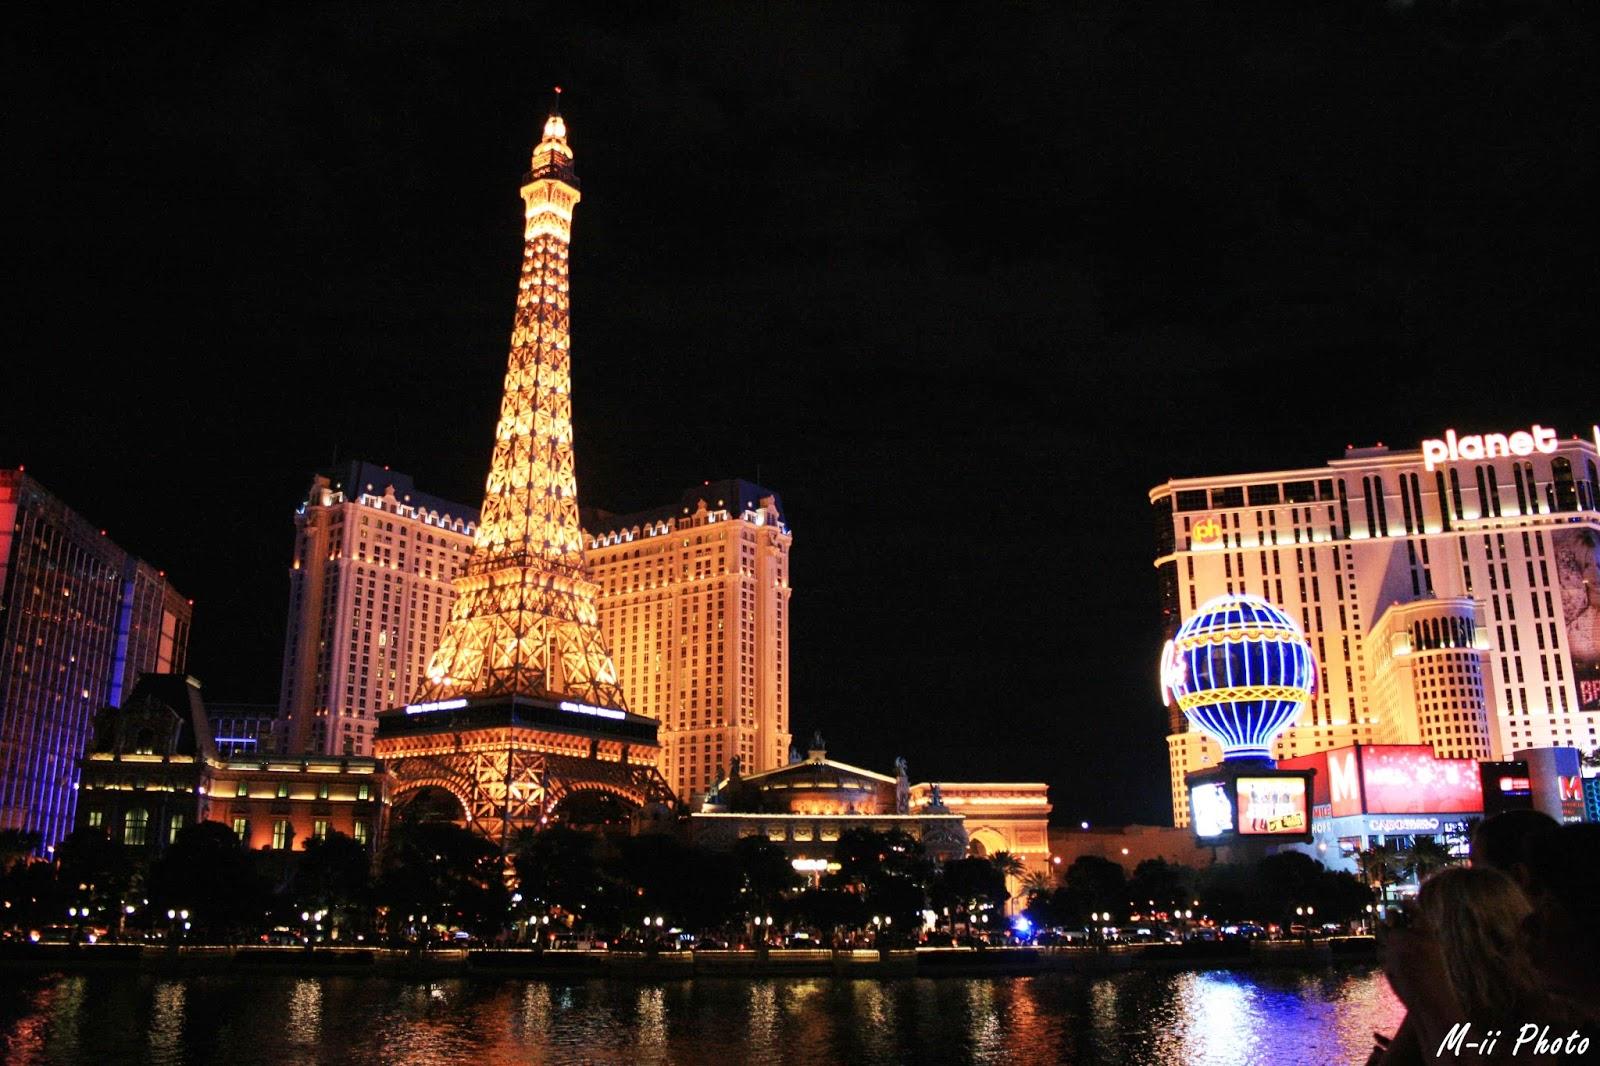 M-ii Photo : Las Vegas Paris Las Vegas